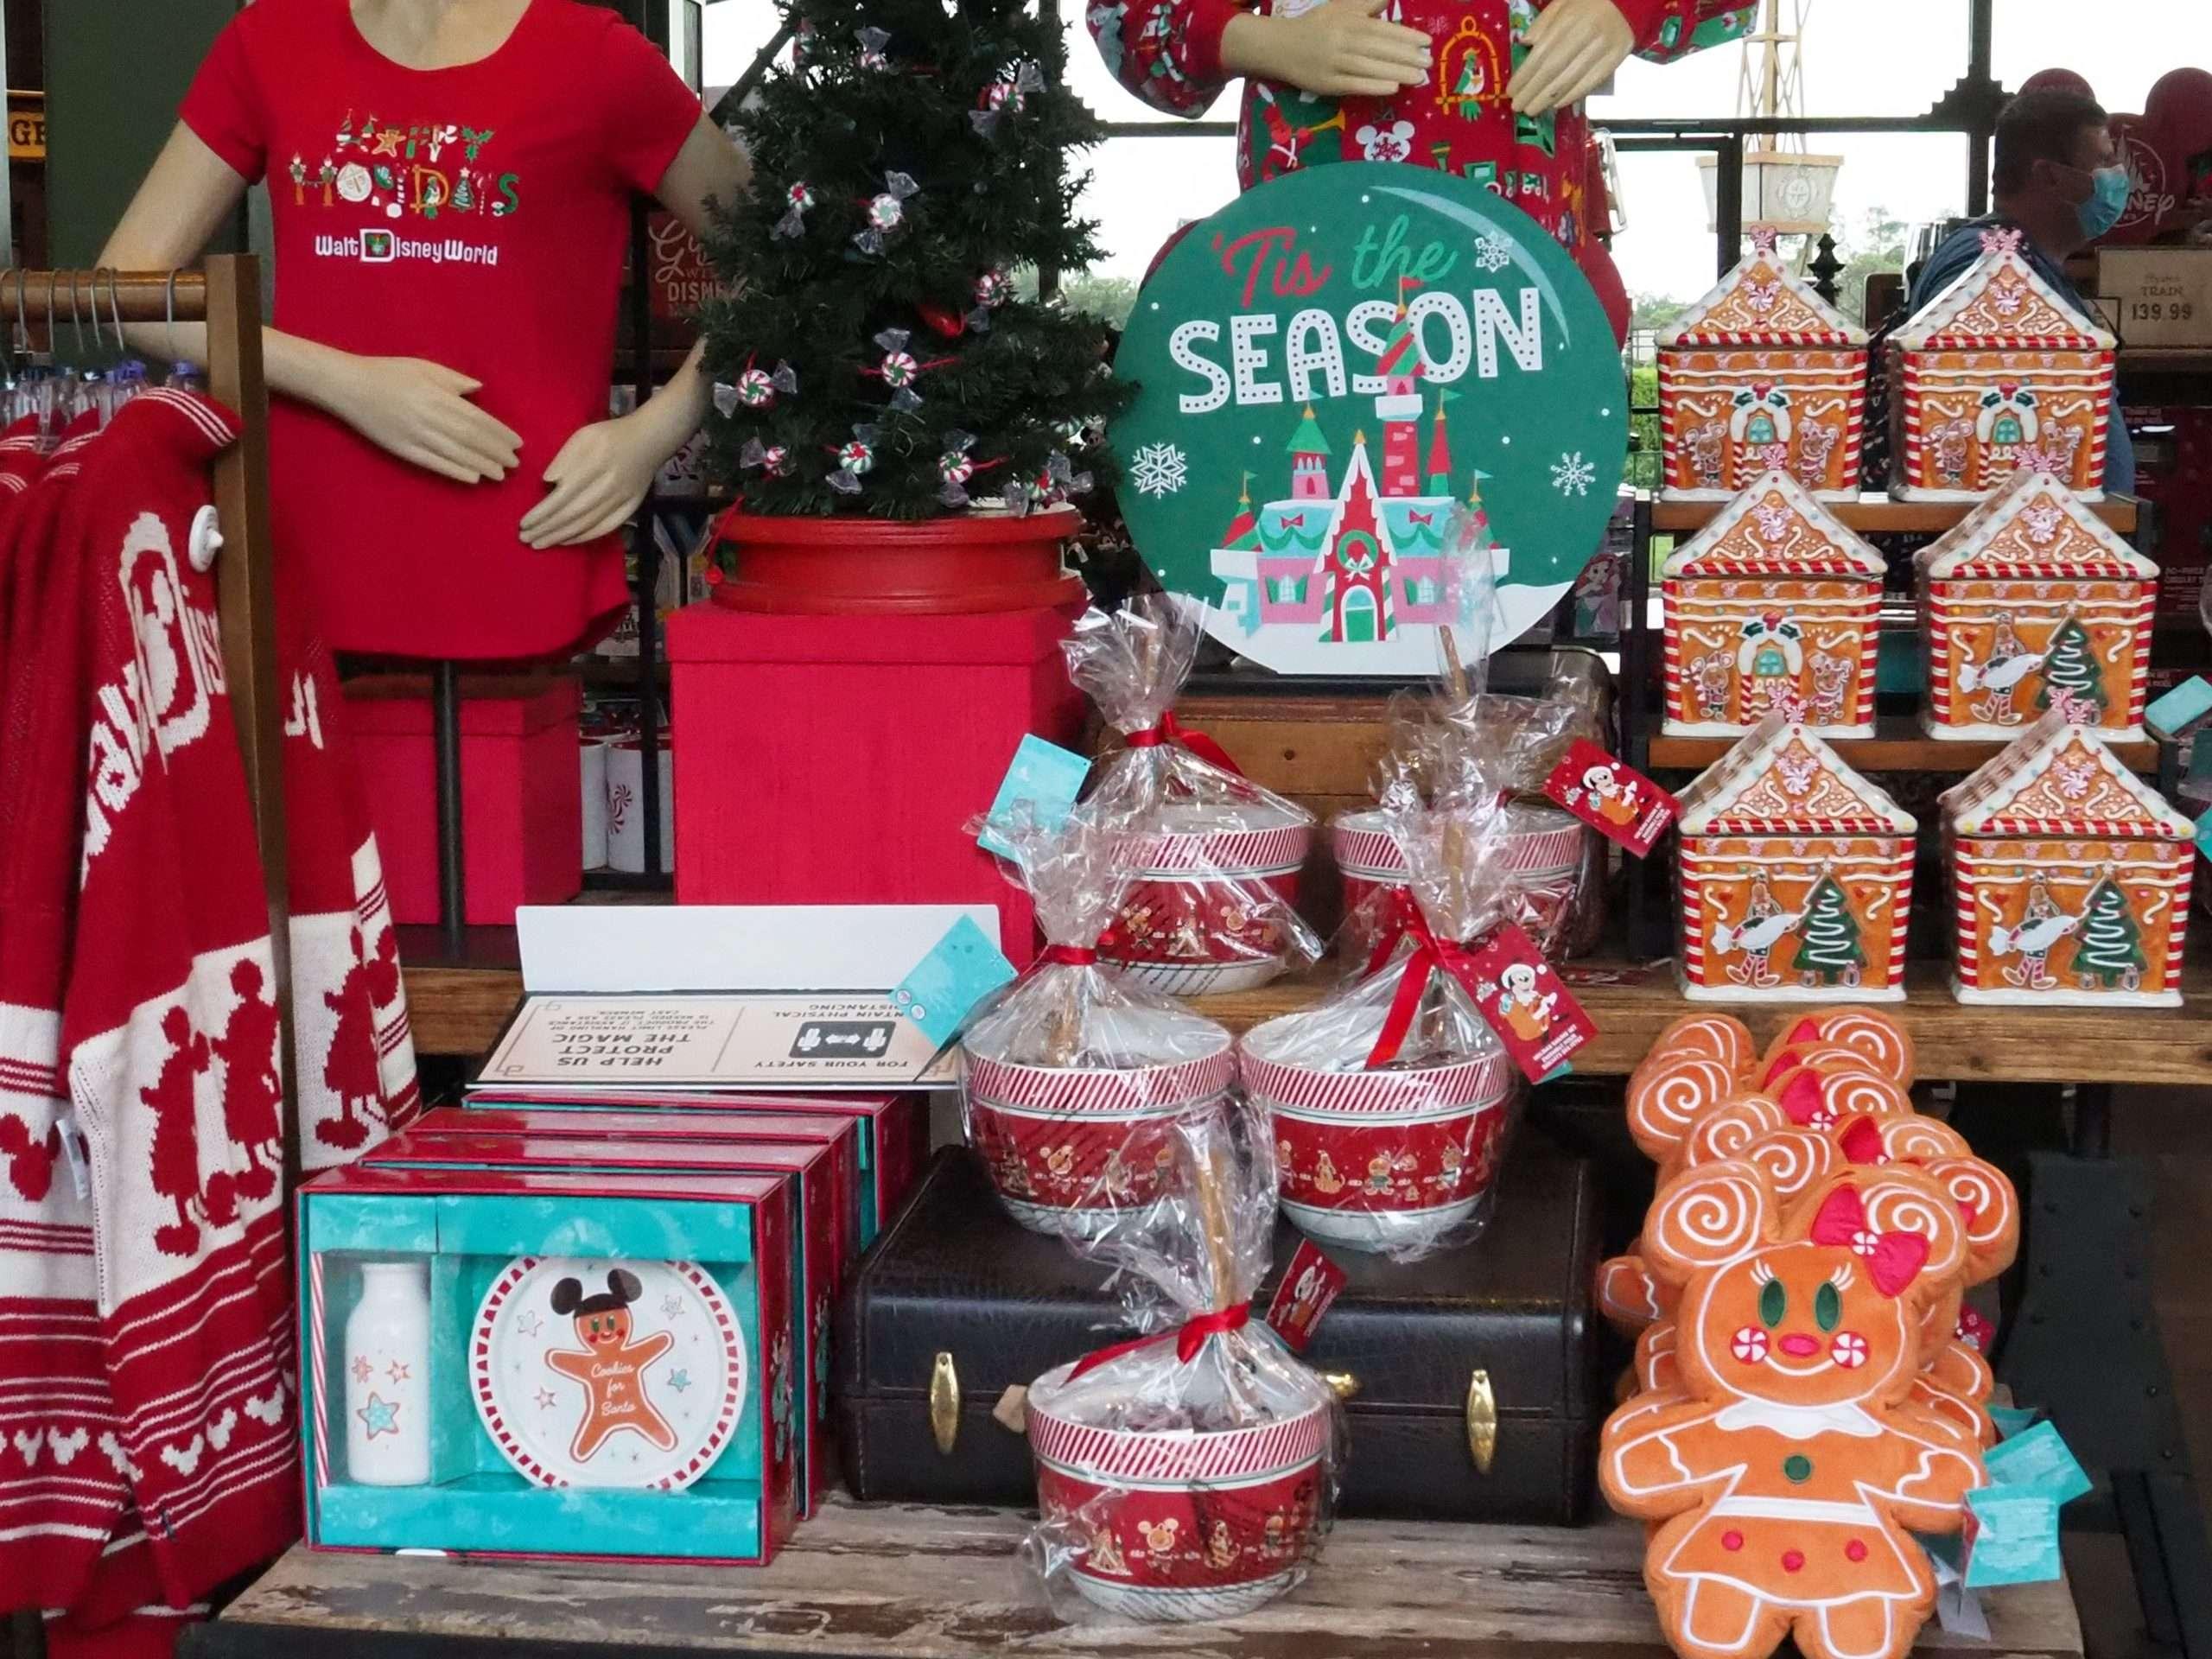 Disney Christmas Gift Guide 2020